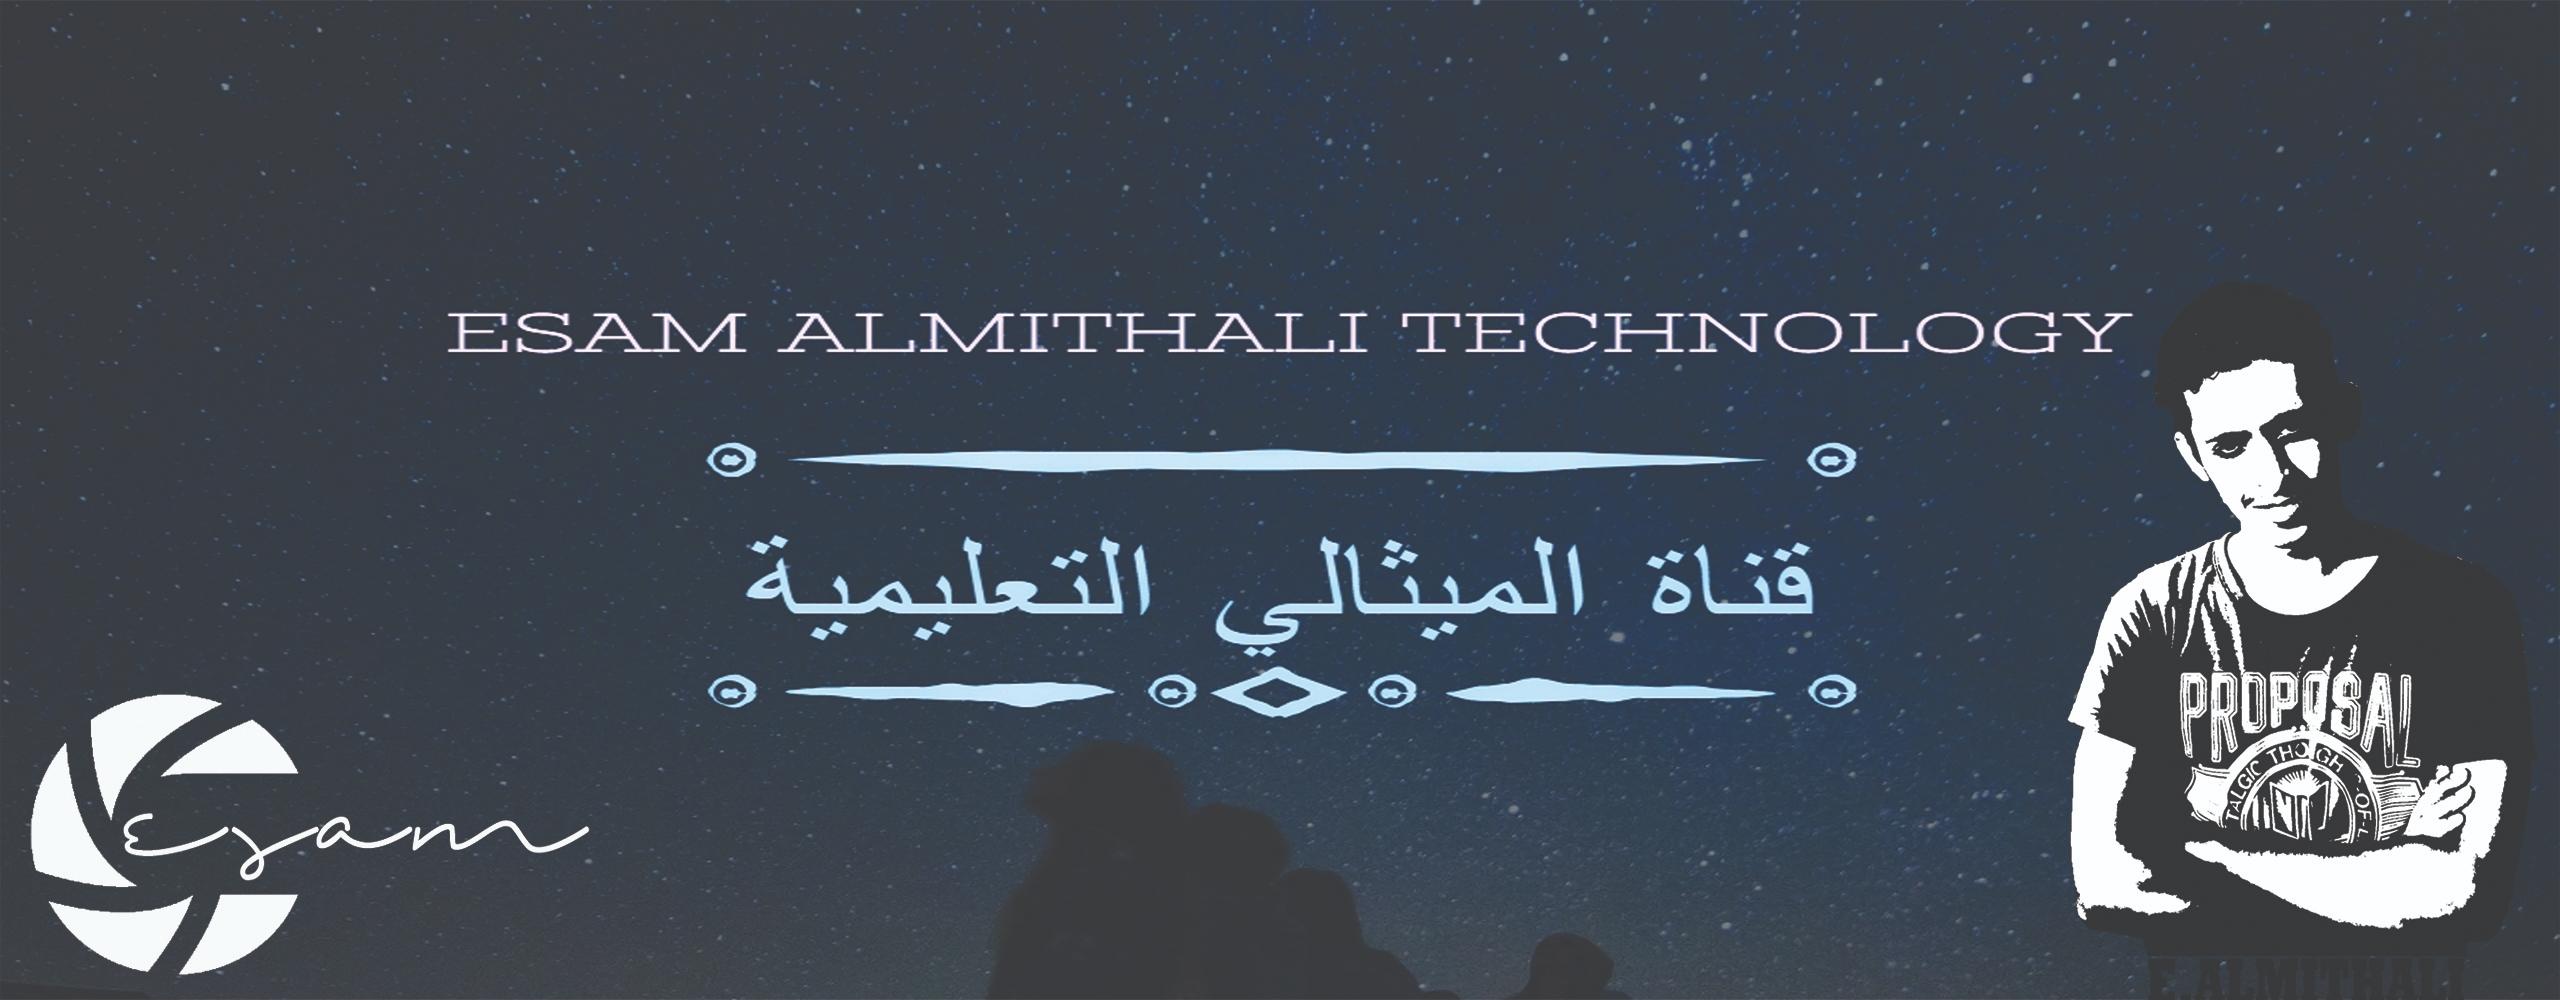 ESAM NASSER AHMED ALMITHALI (@almithali) Cover Image